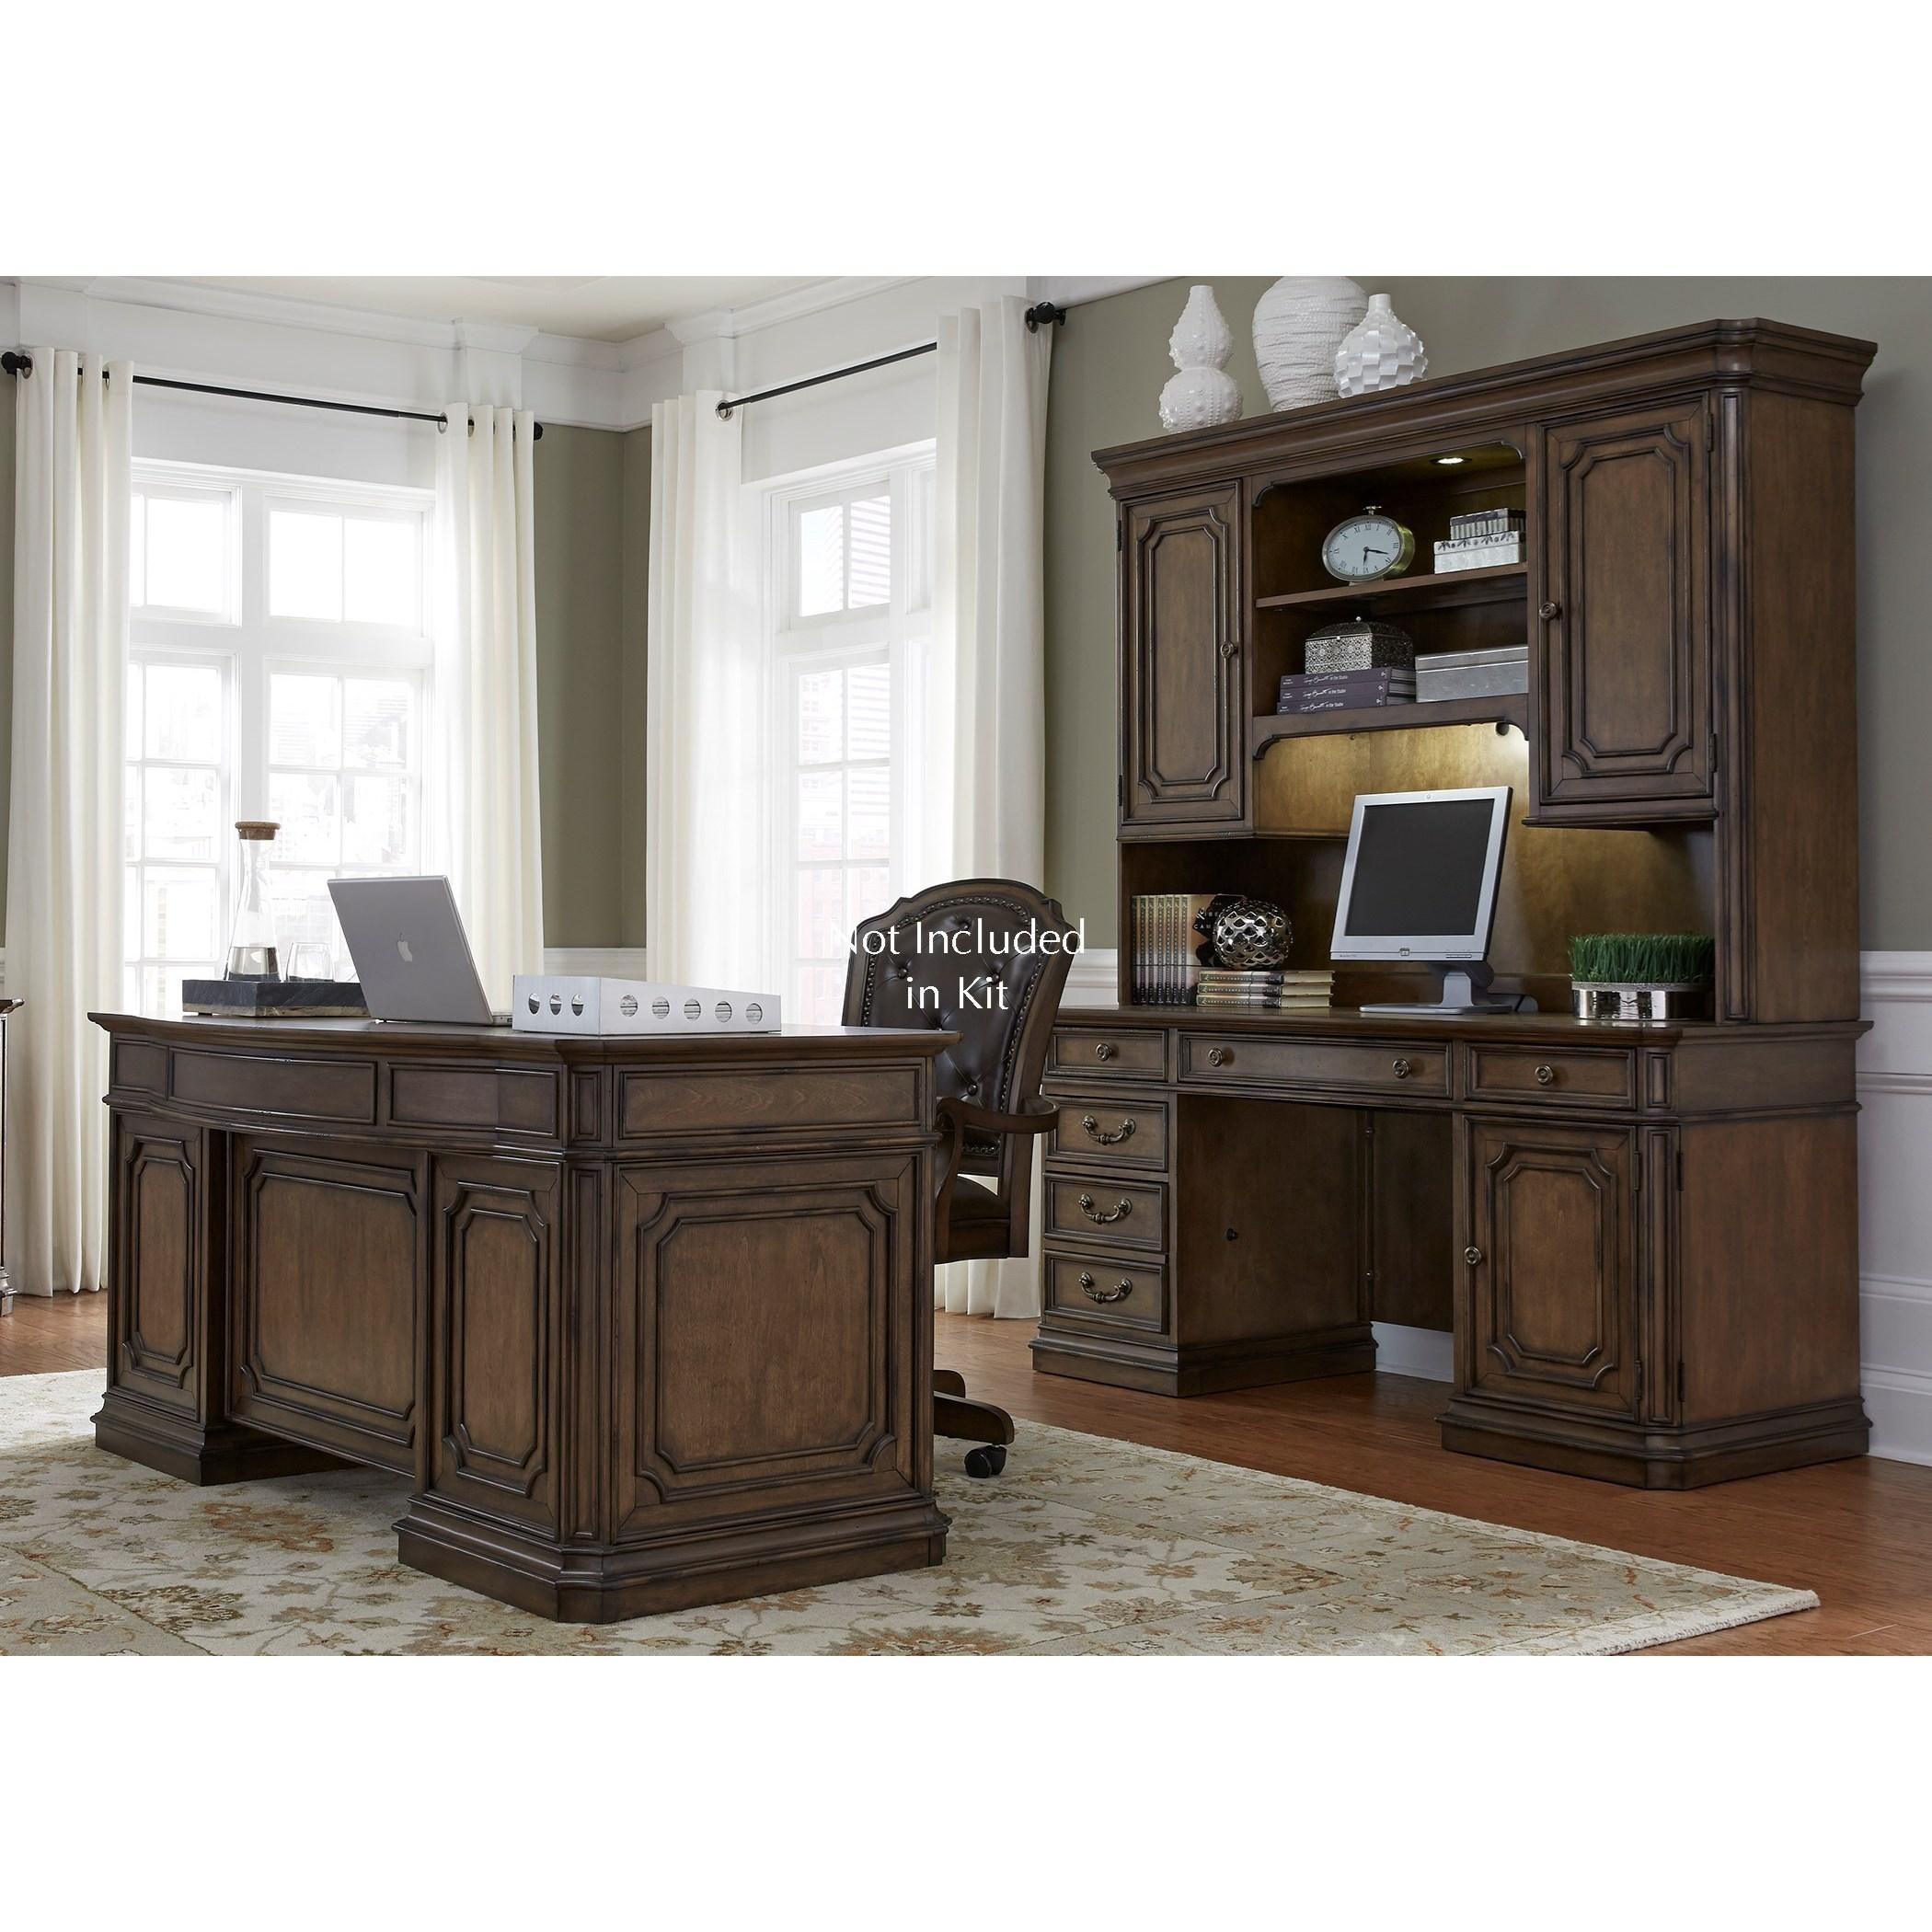 Amelia Home Office 5 Piece Jr Executive Set  by Liberty Furniture at Suburban Furniture